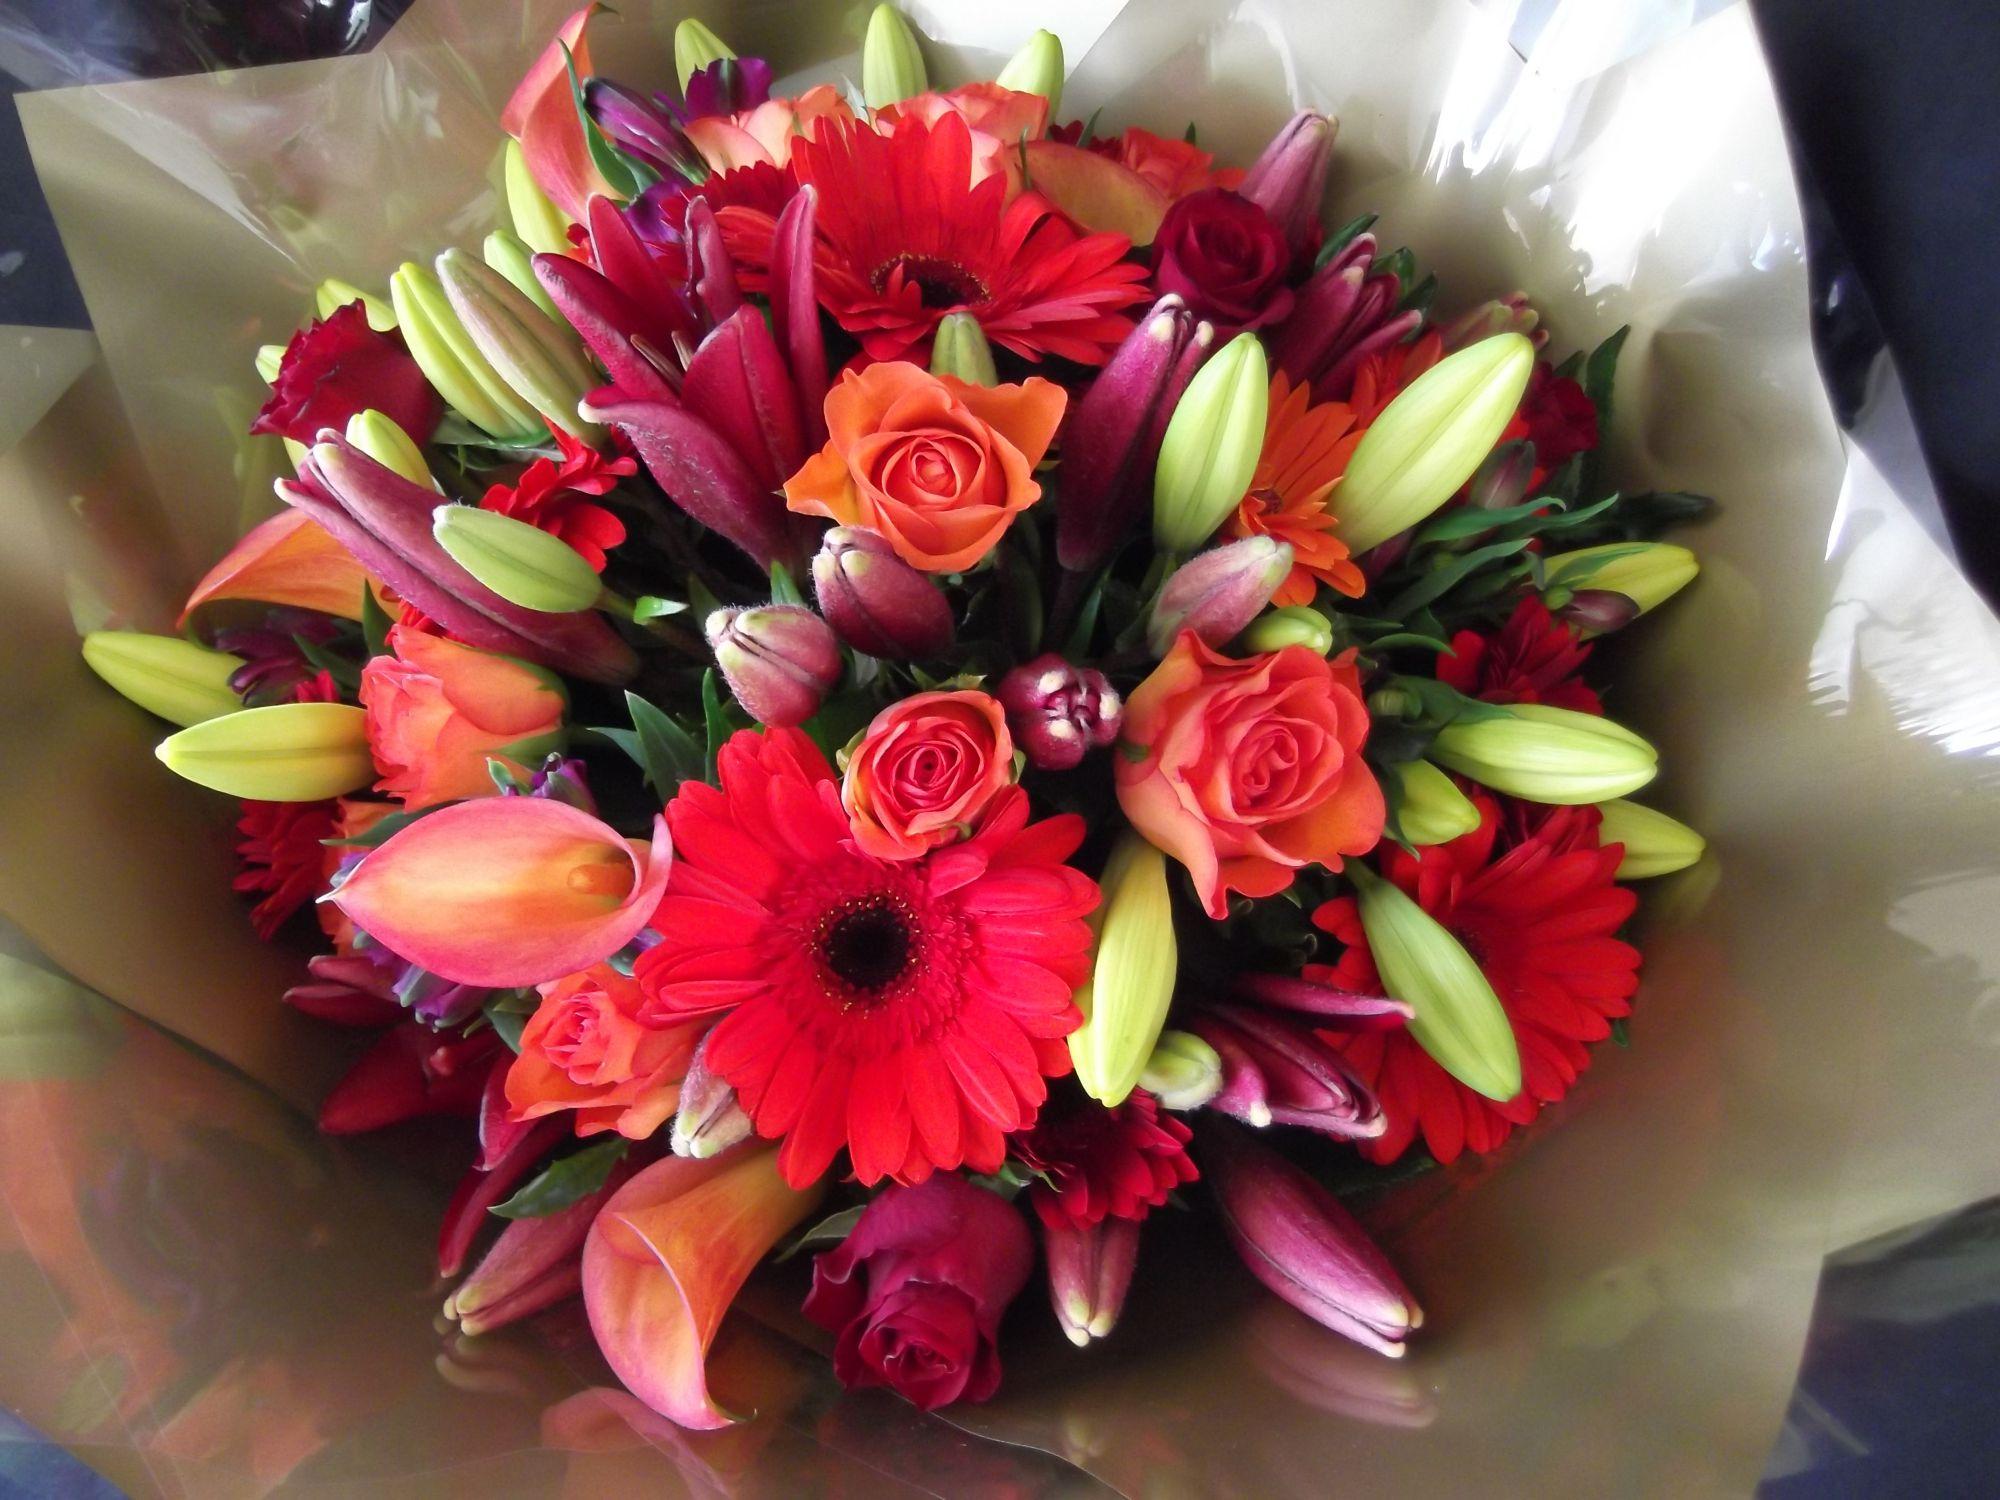 Free photo bouquet of flowers romantic romance rose free bouquet of flowers izmirmasajfo